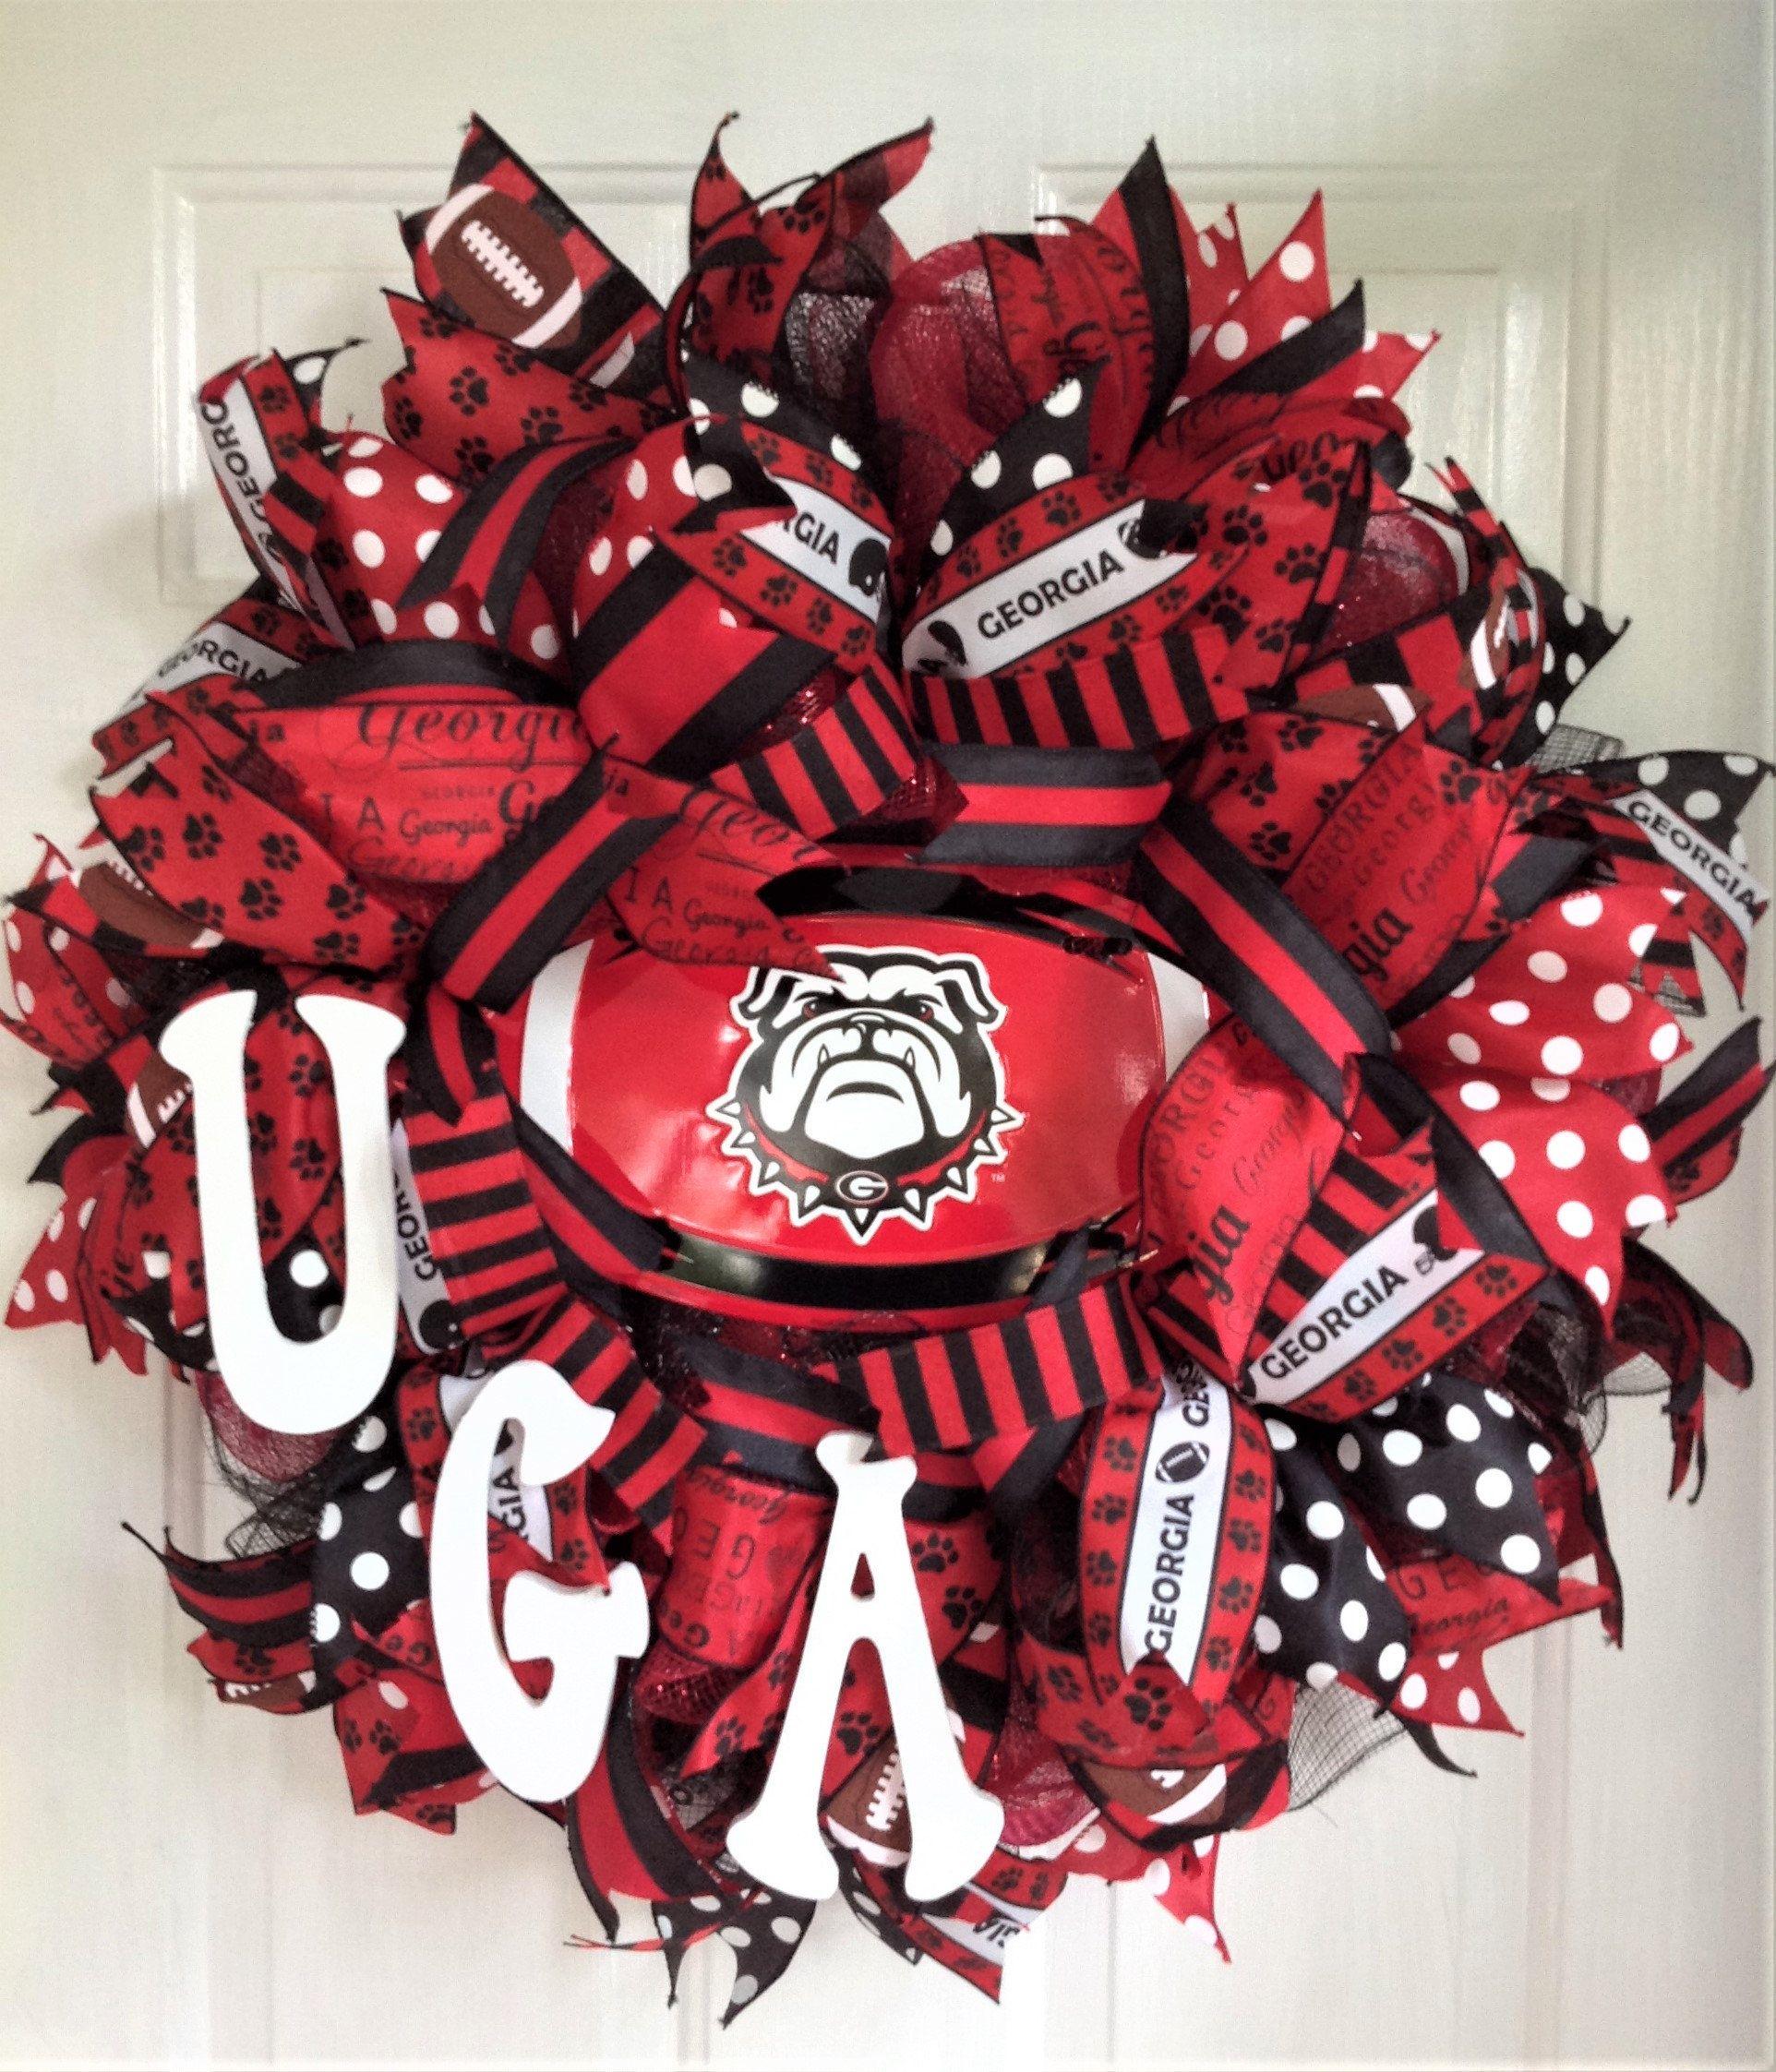 Georgia Bulldogs Wreath Georgia Football Decor,UGA Door Hanger,Georgia Wreath Football Wreath University of Georgia Door Wreath